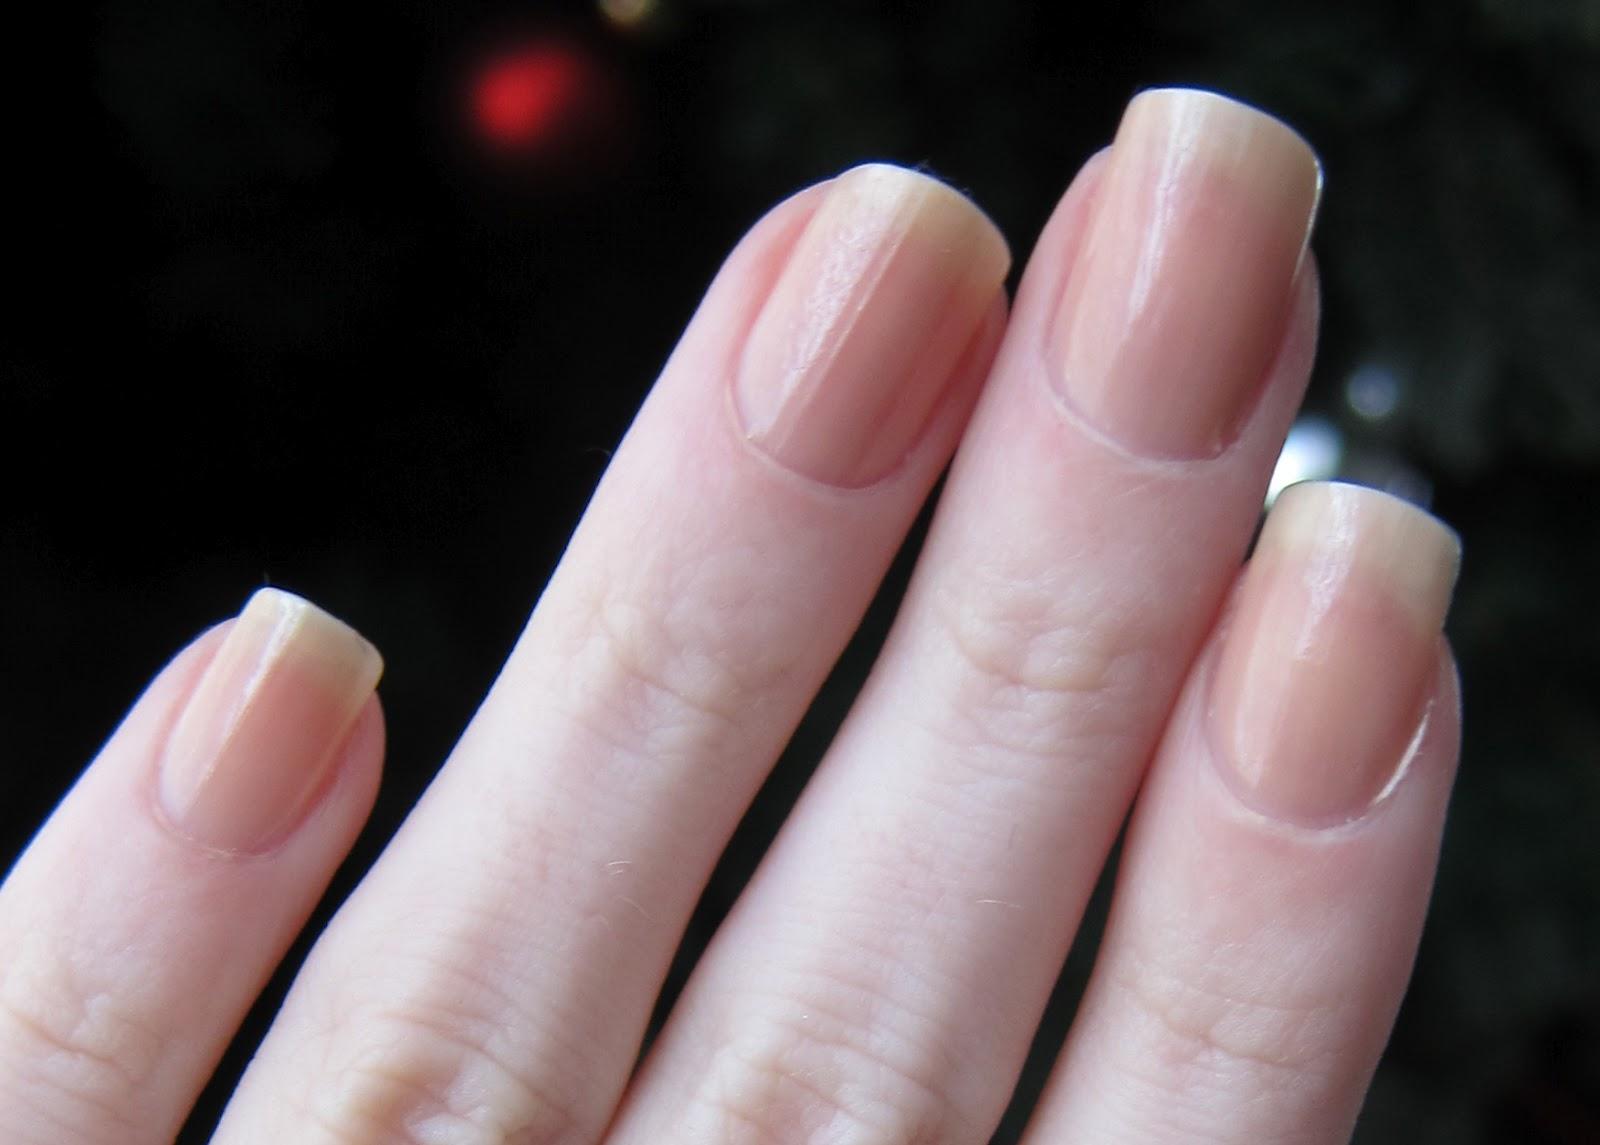 Piano Finger(nail)s: Mannequin Hands with SH CSM Cafe Au Lait